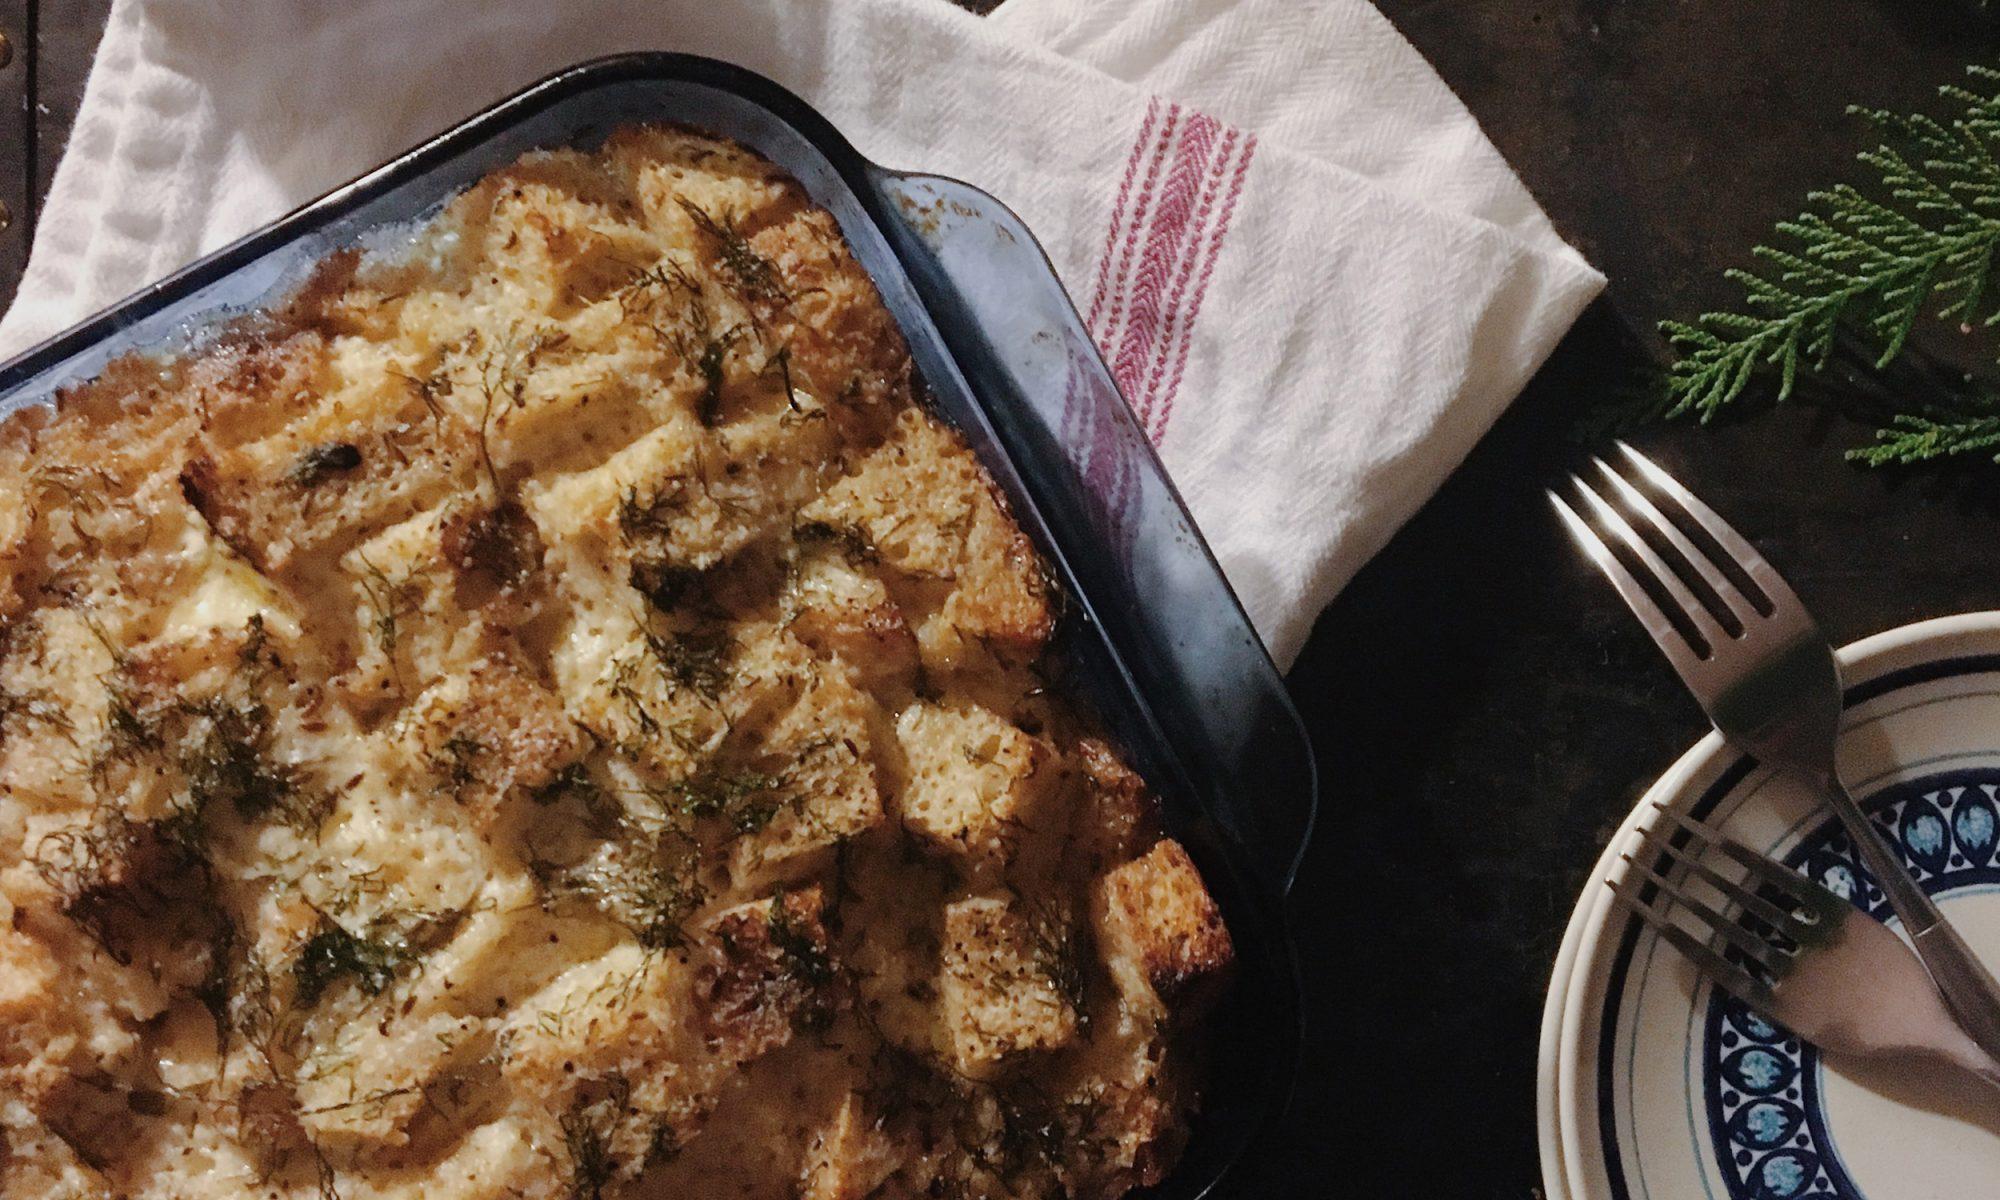 Slow Cooker Strata Lets You Feel Like Martha Stewart, But Way Lazier